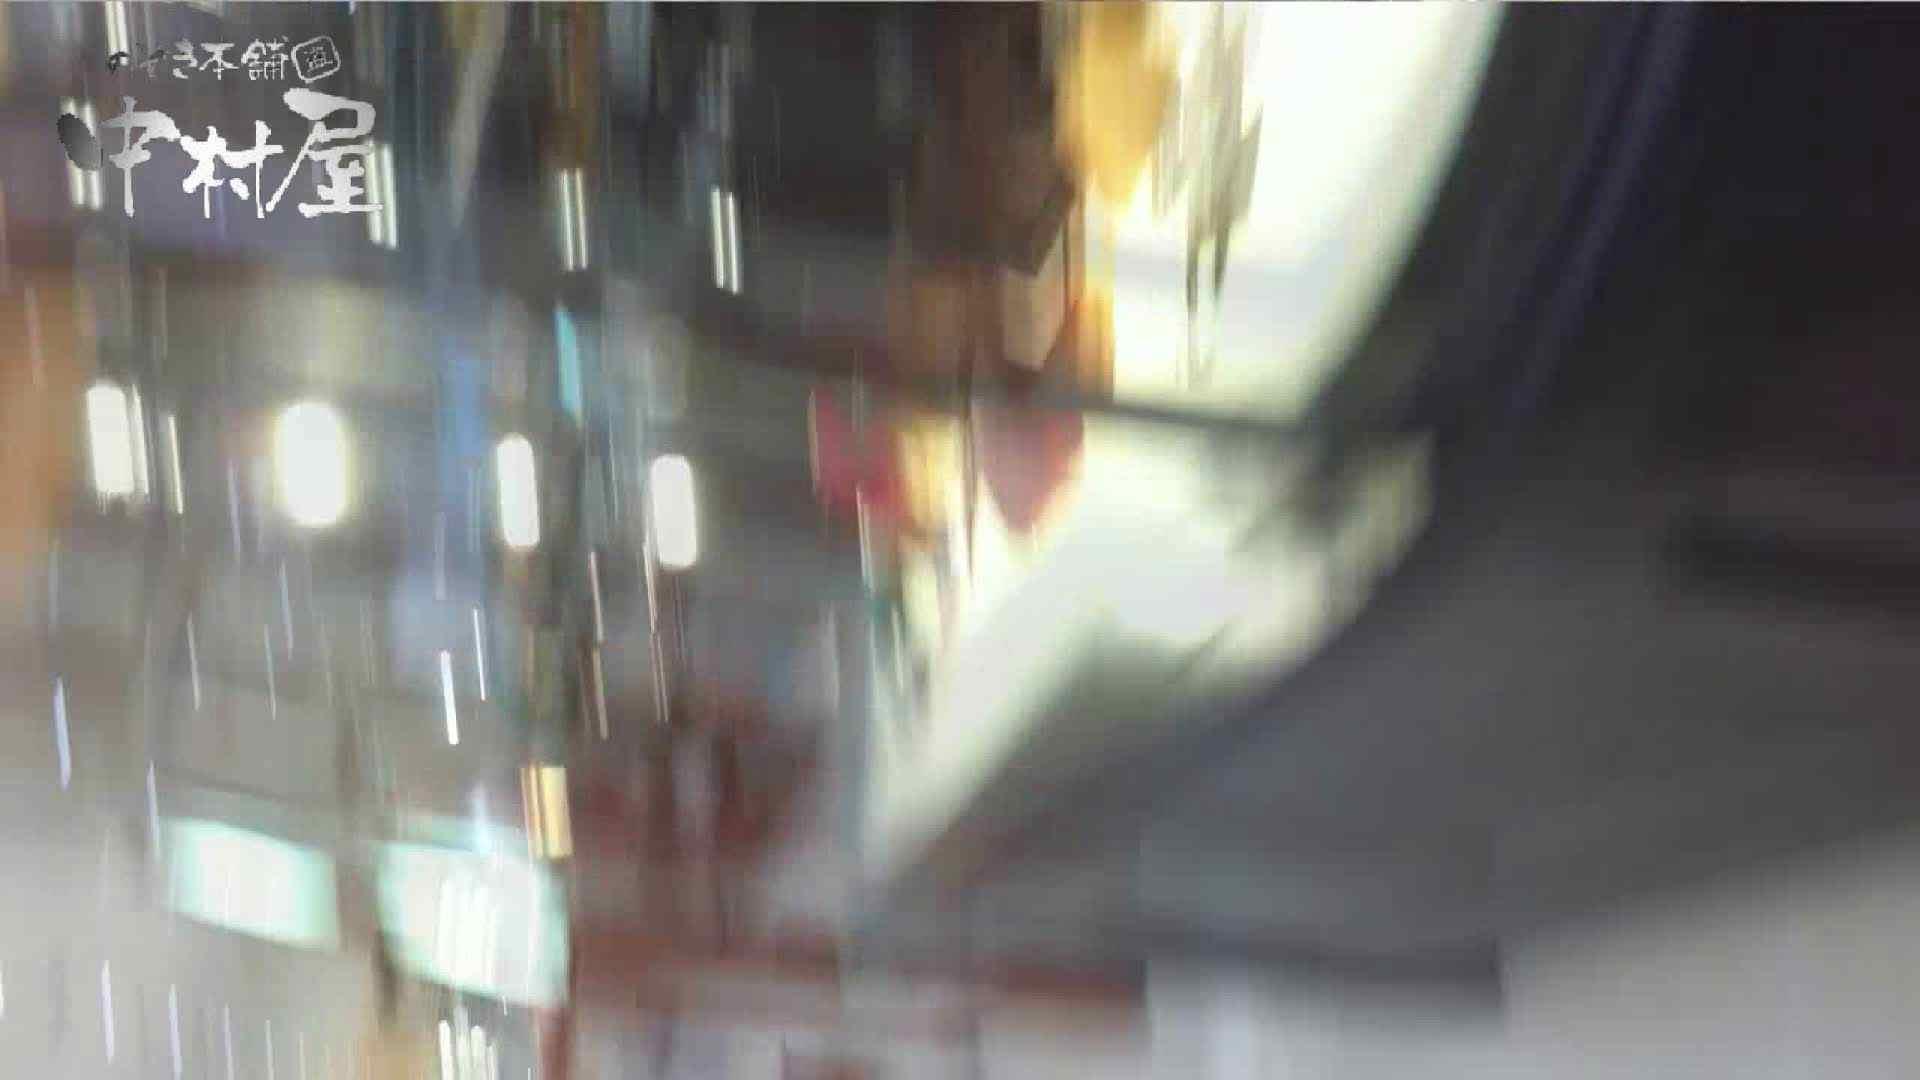 vol.49 可愛いカリスマ店員‼胸チラ&パンチラ お嬢様系店員さん 胸チラ アダルト動画キャプチャ 101PIX 39